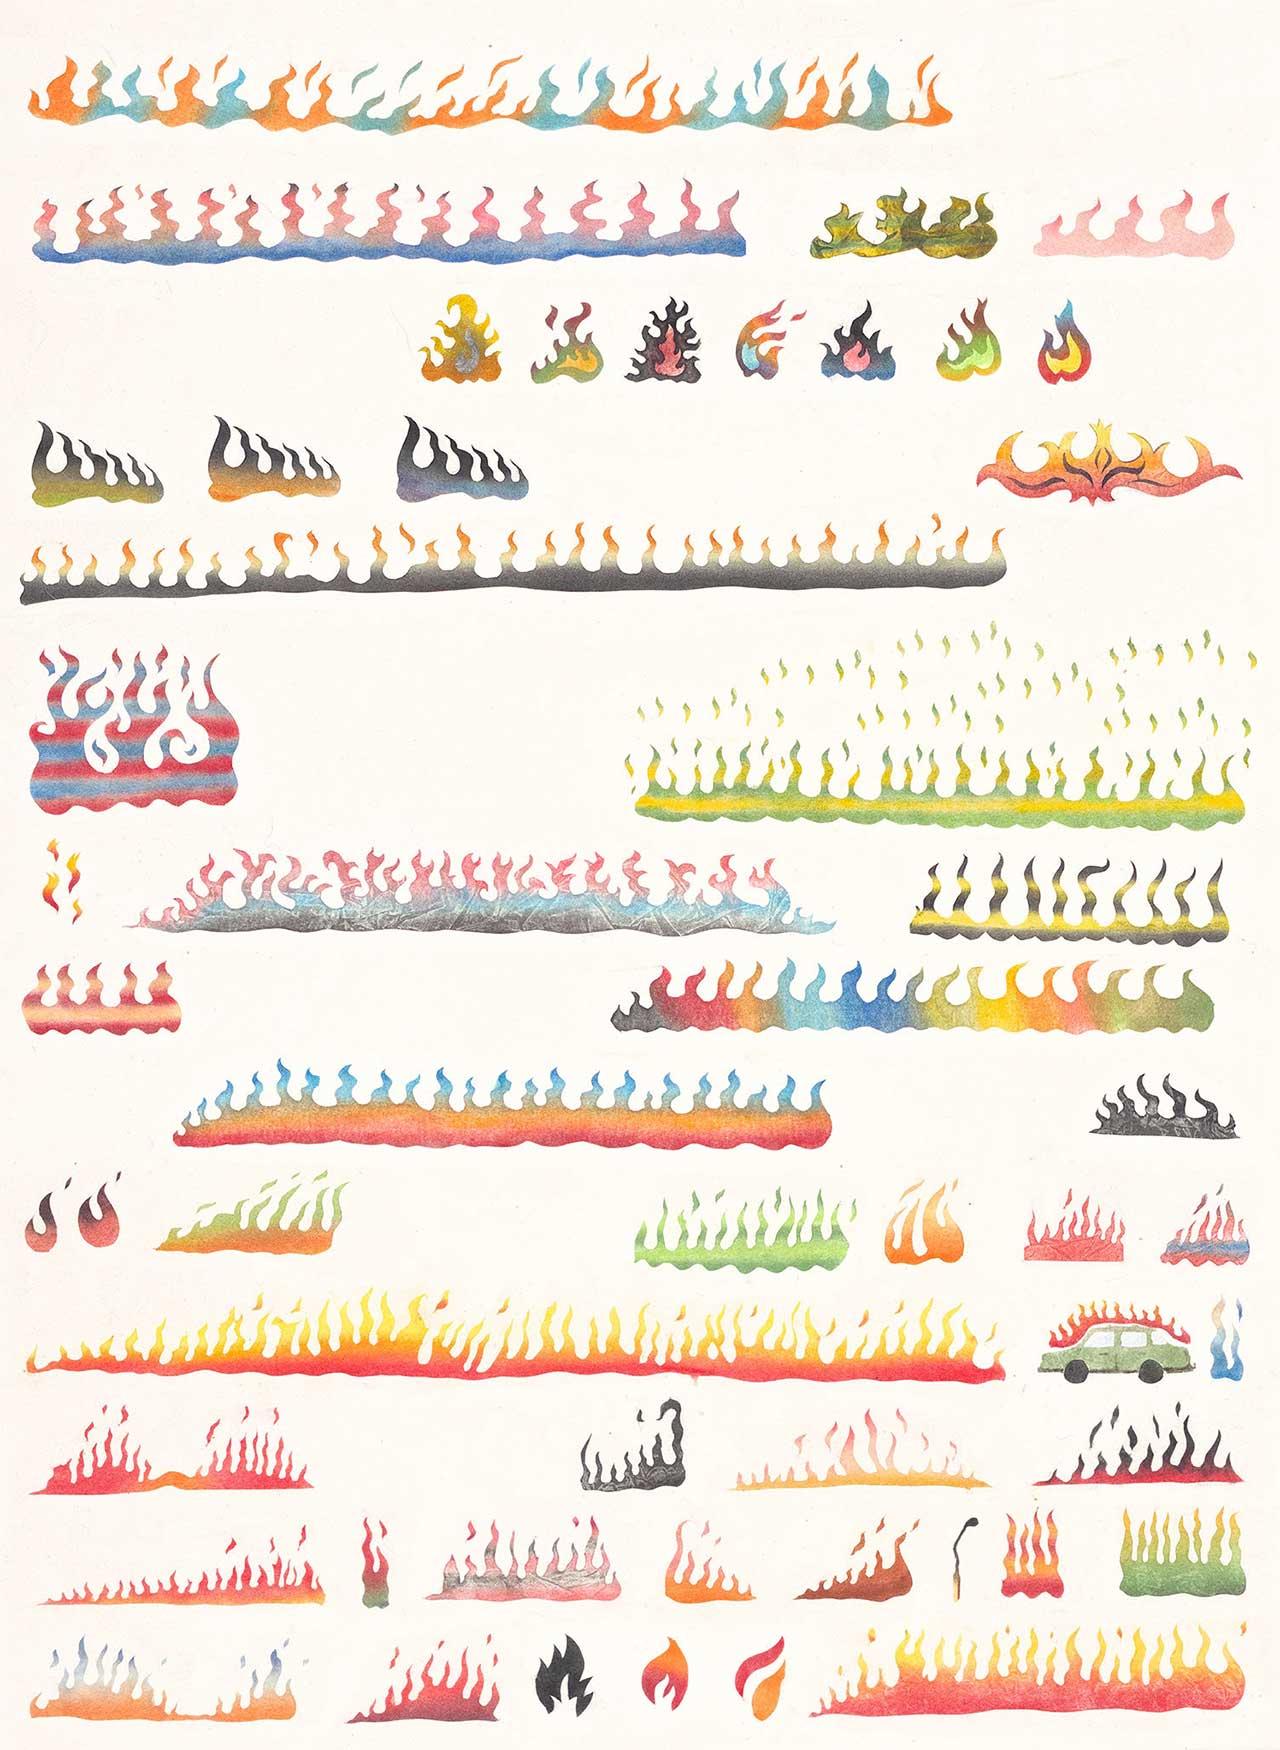 53 types of fire, 2020, χρώματα σκόνη σε χαρτί, 80Χ60 εκ.